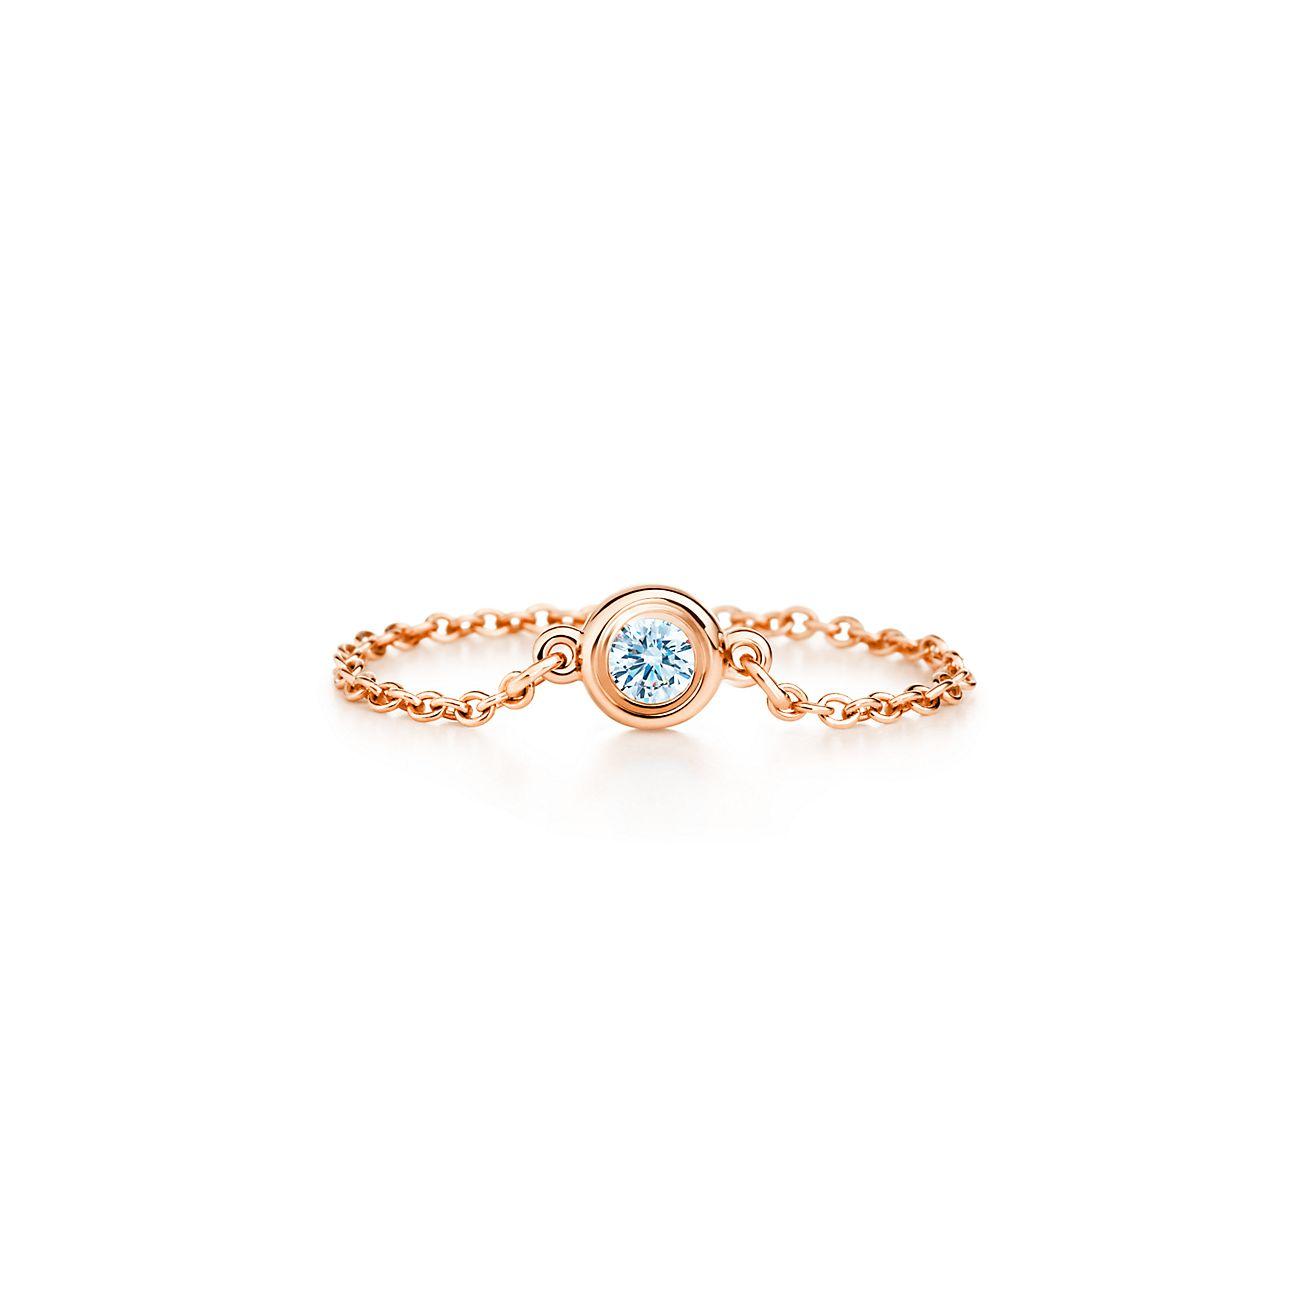 new elsa peretti diamonds by the yard ring in 18k rose gold - Elsa Peretti Color By The Yard Ring